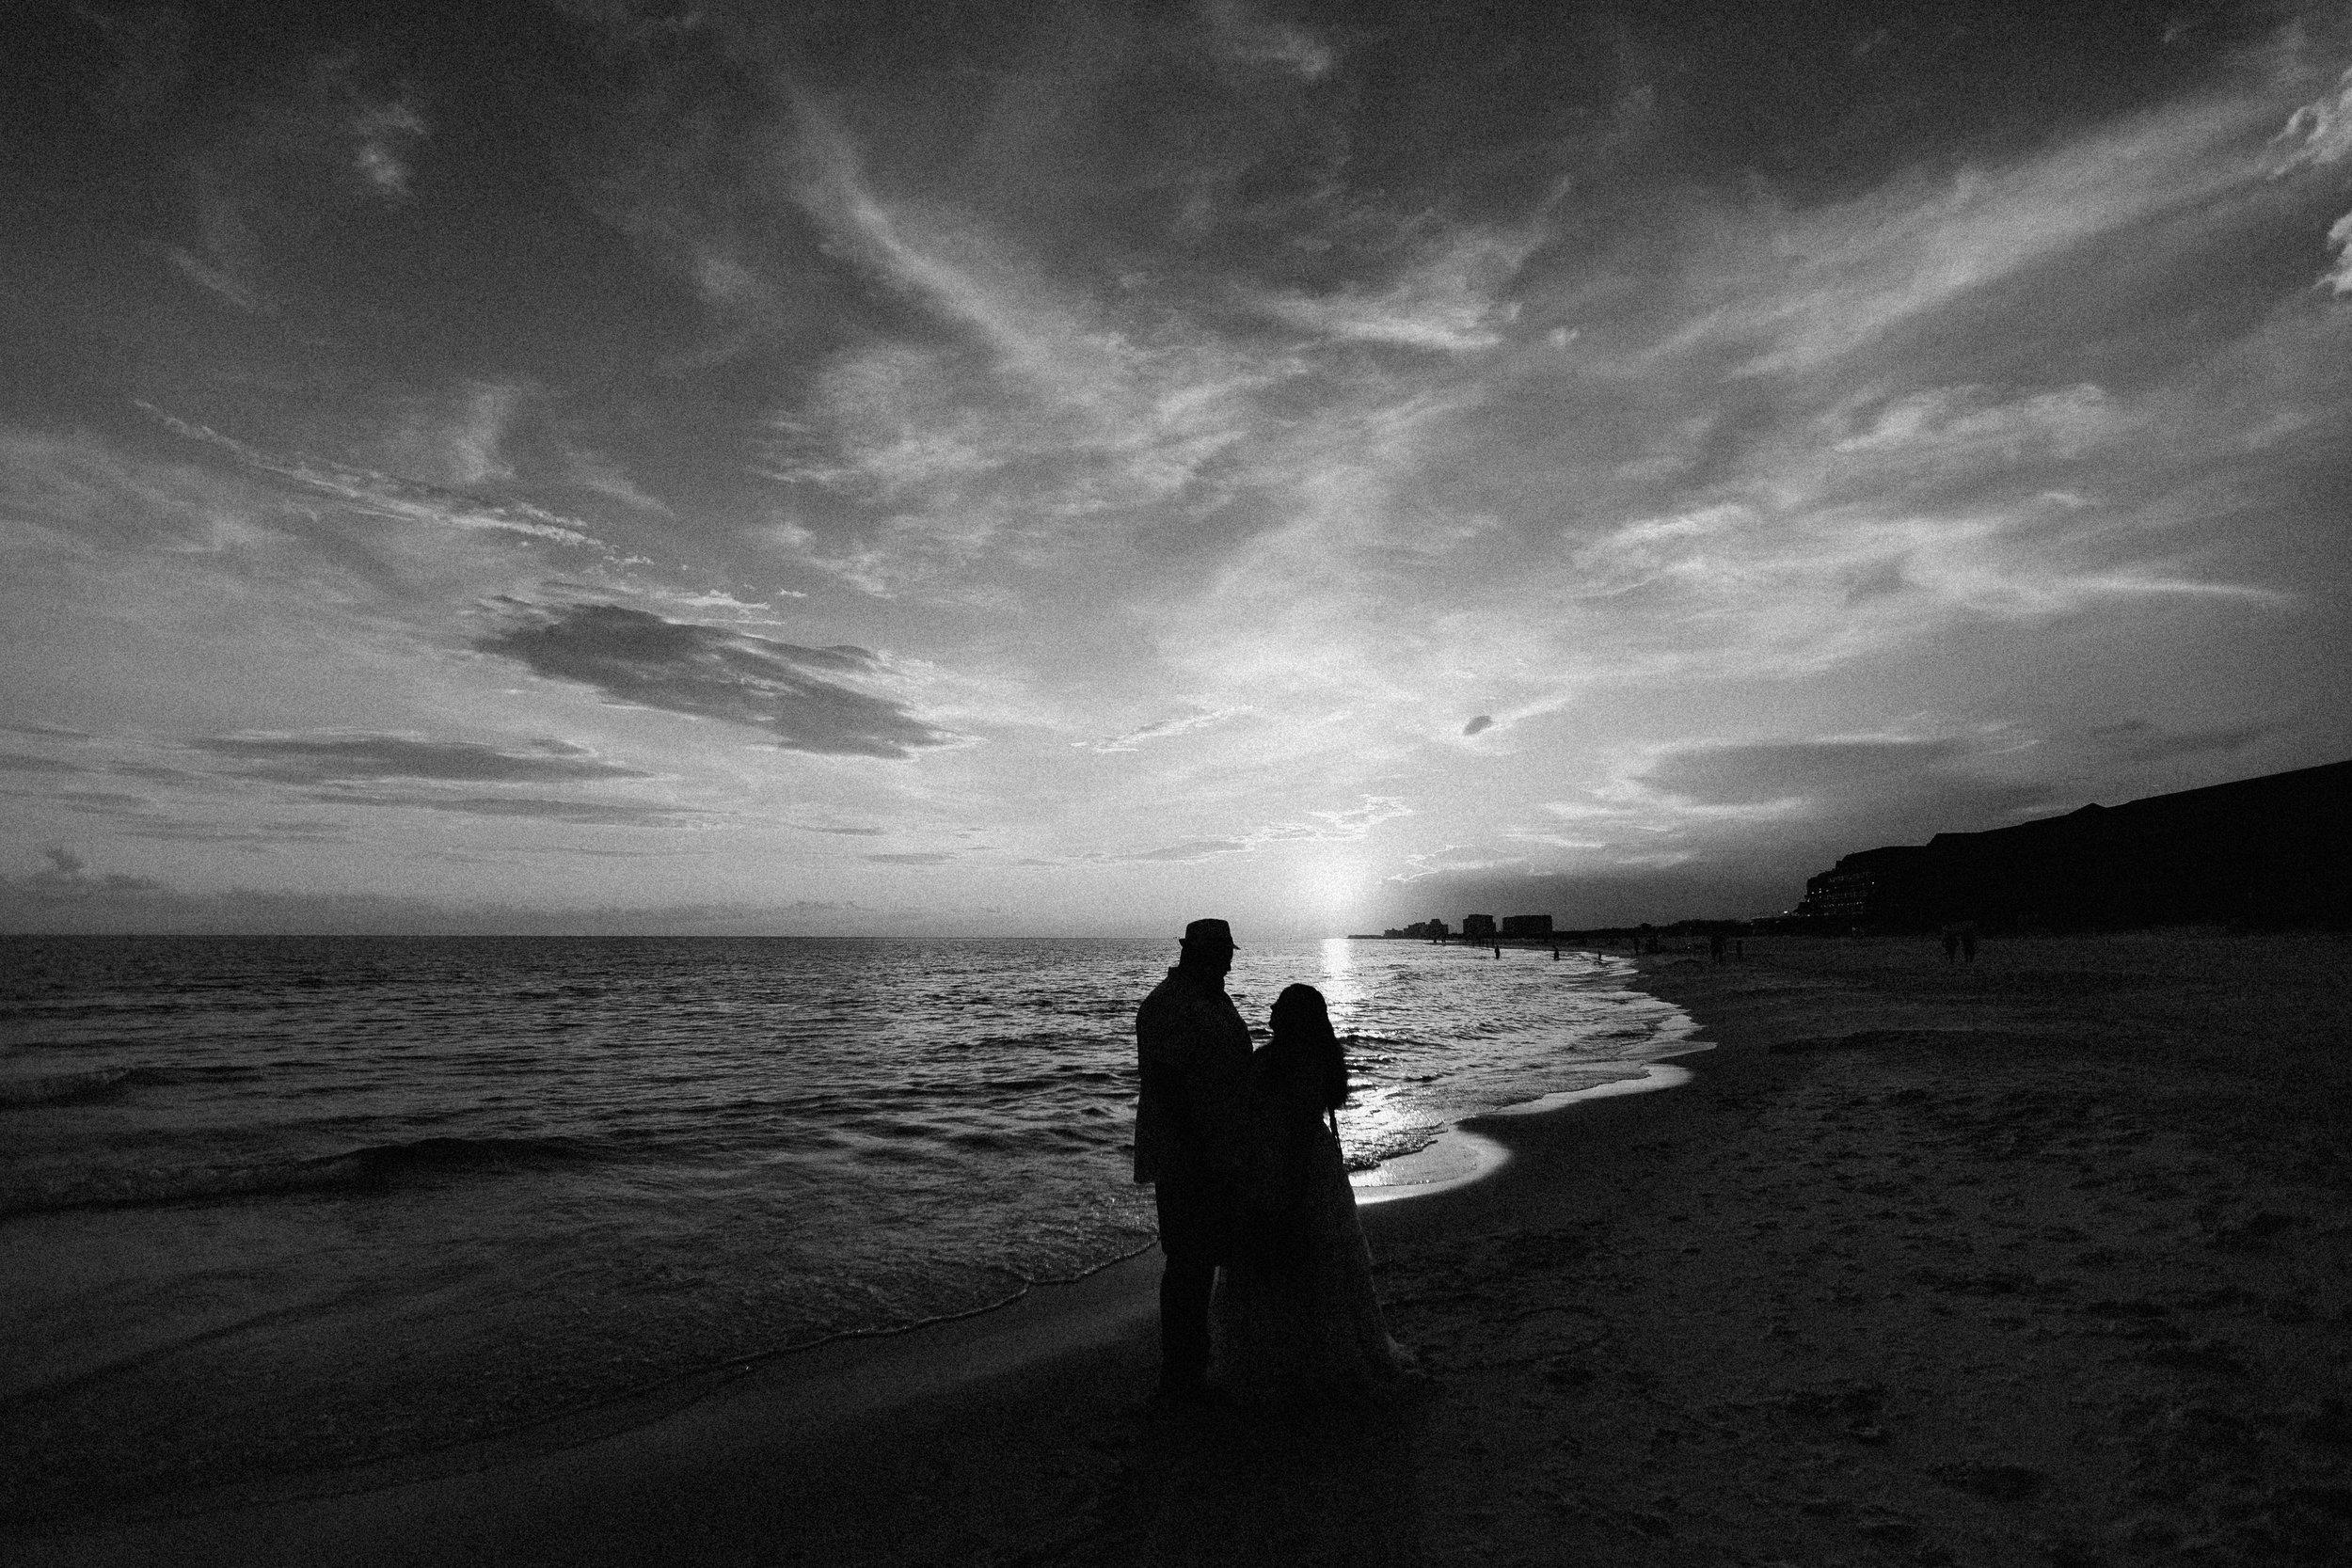 destin_sunset_beach_elopement_intimate_wedding_photographer_florida_documentary_1303.jpg